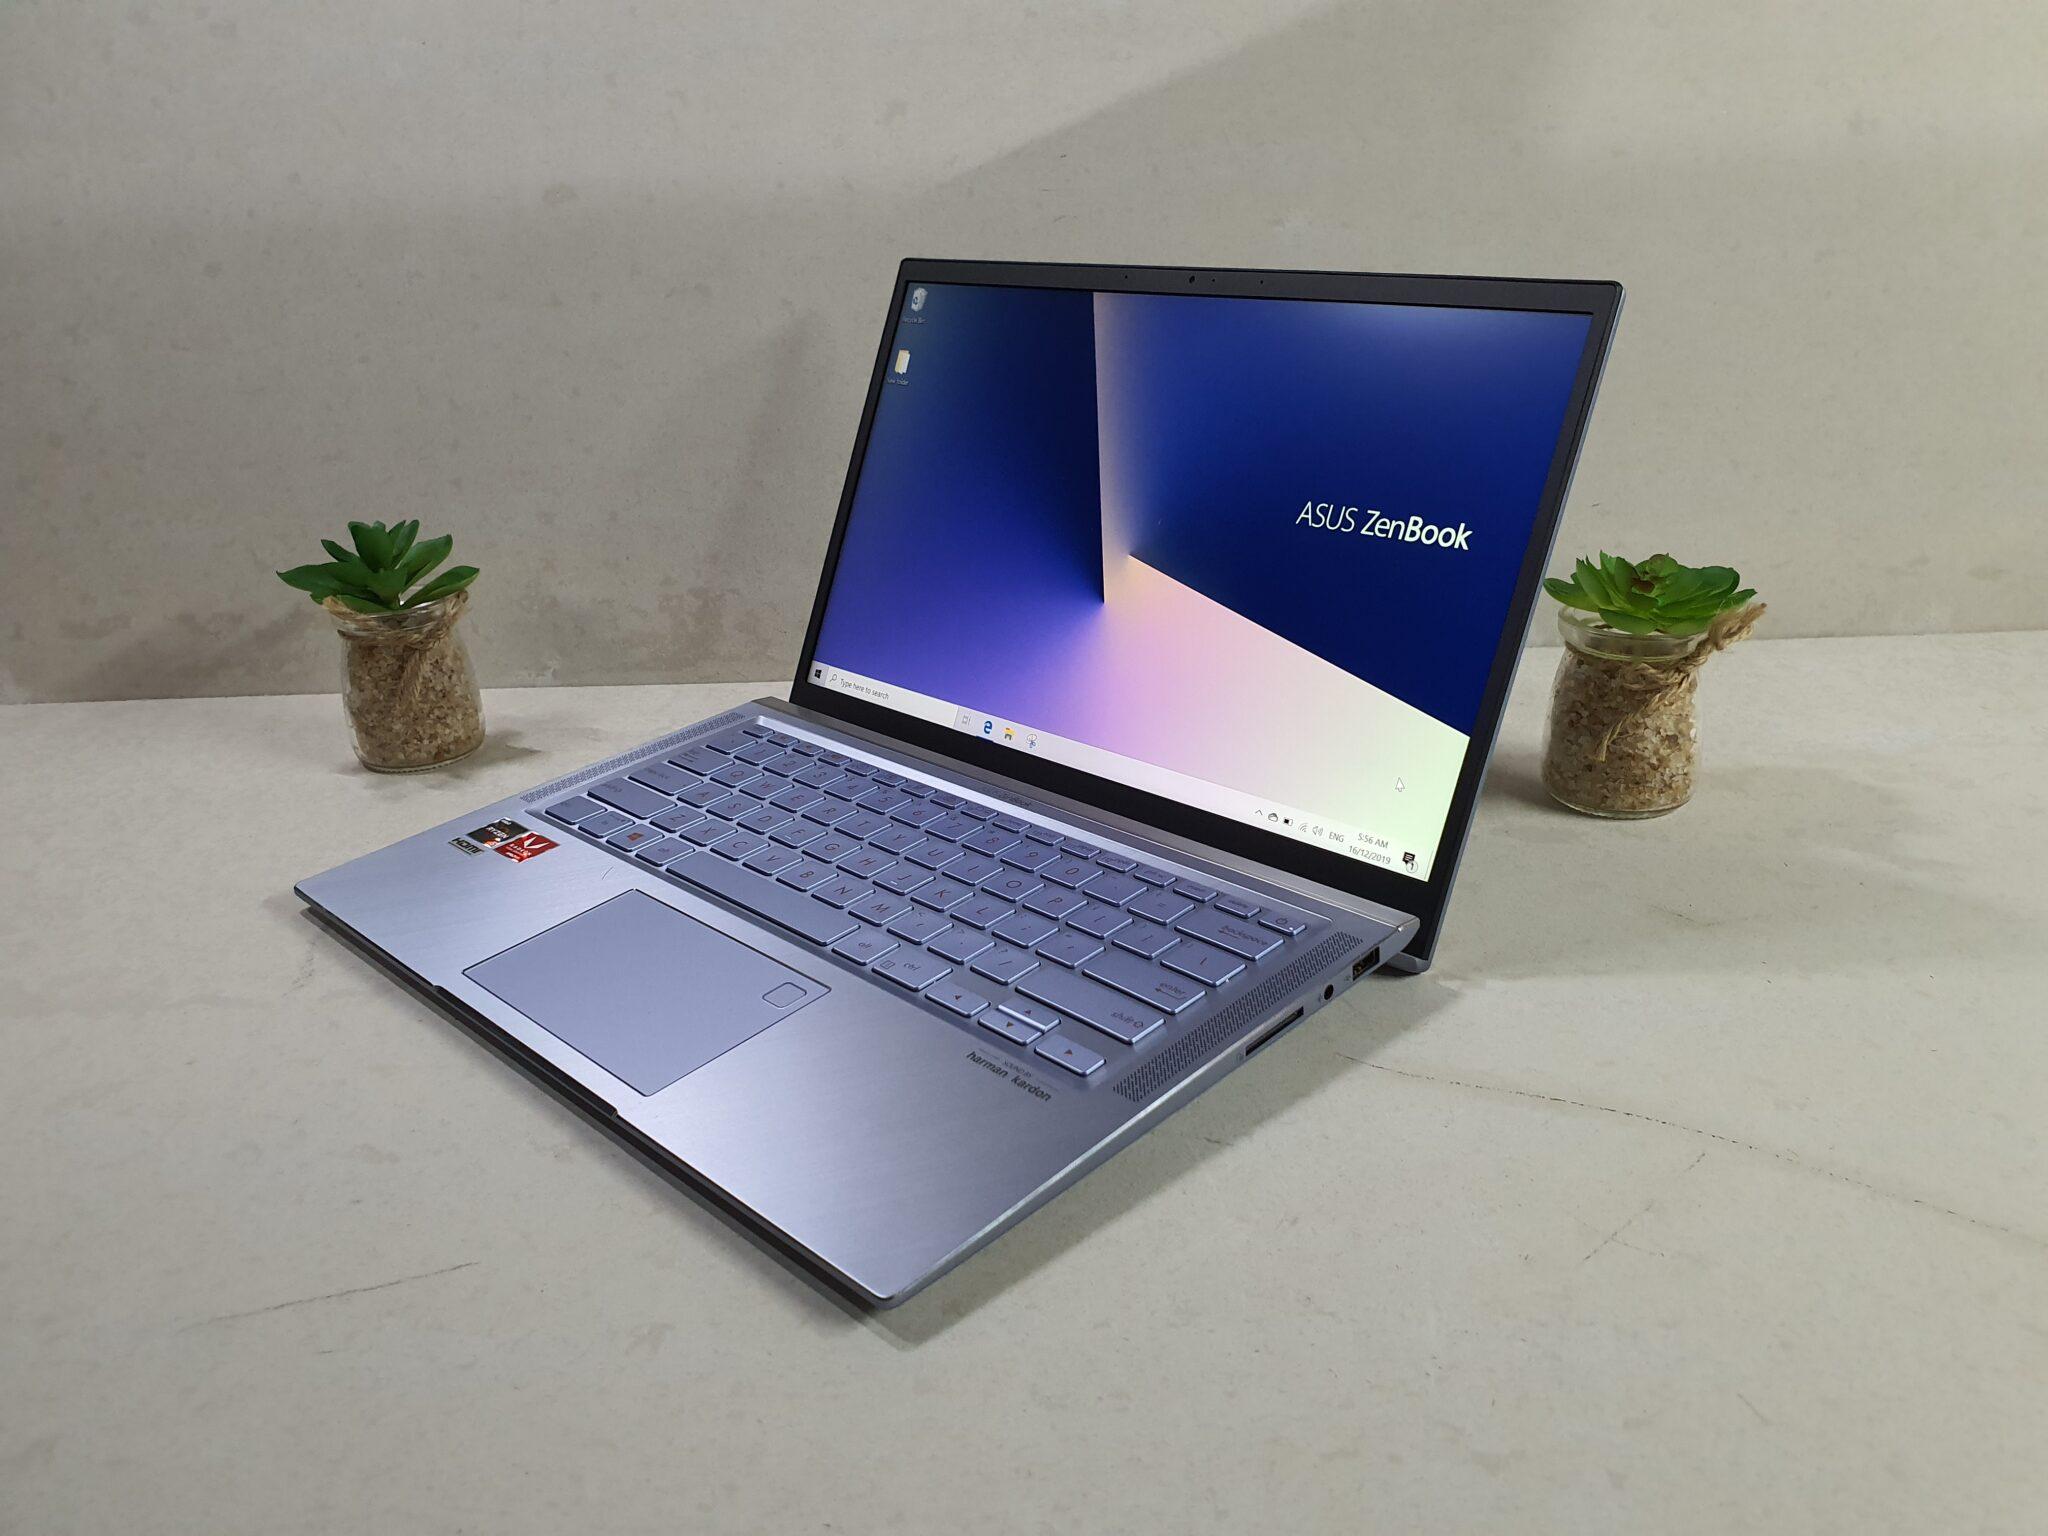 Asus ZenBook 14 UM431 home screen angled